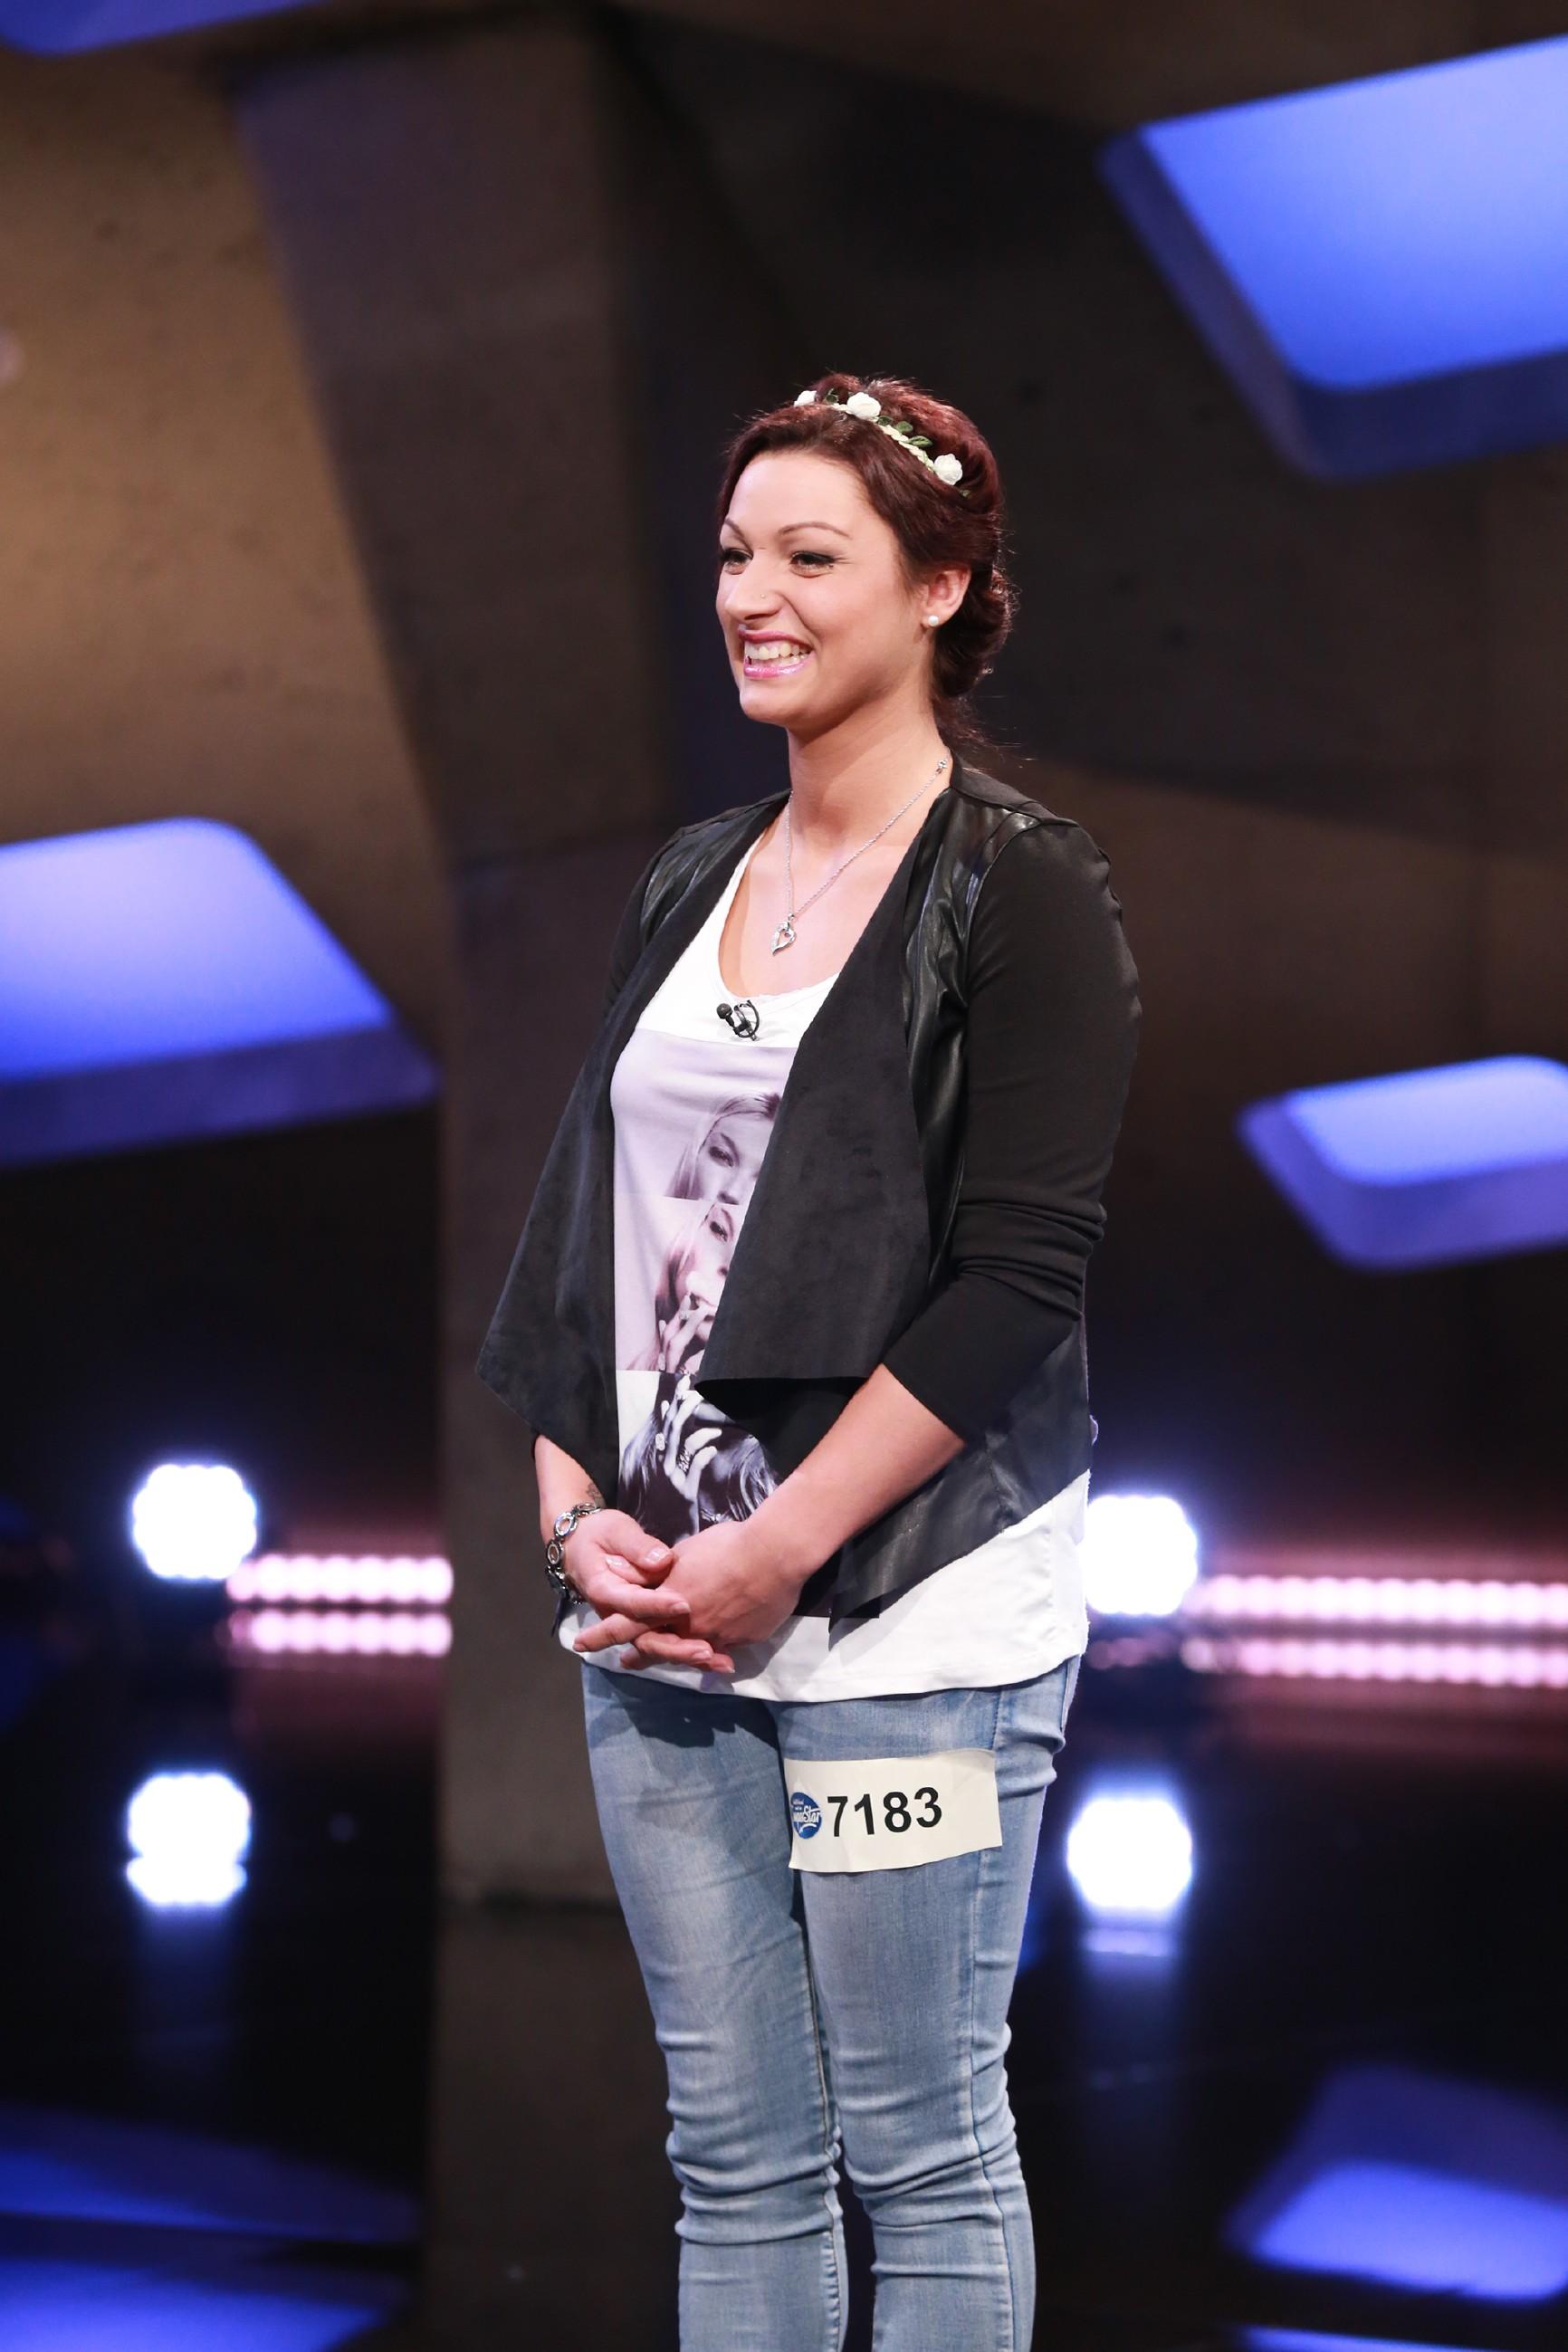 DSDS 2016 Casting 1 - Angelika Wolf aus Bad Arolsen